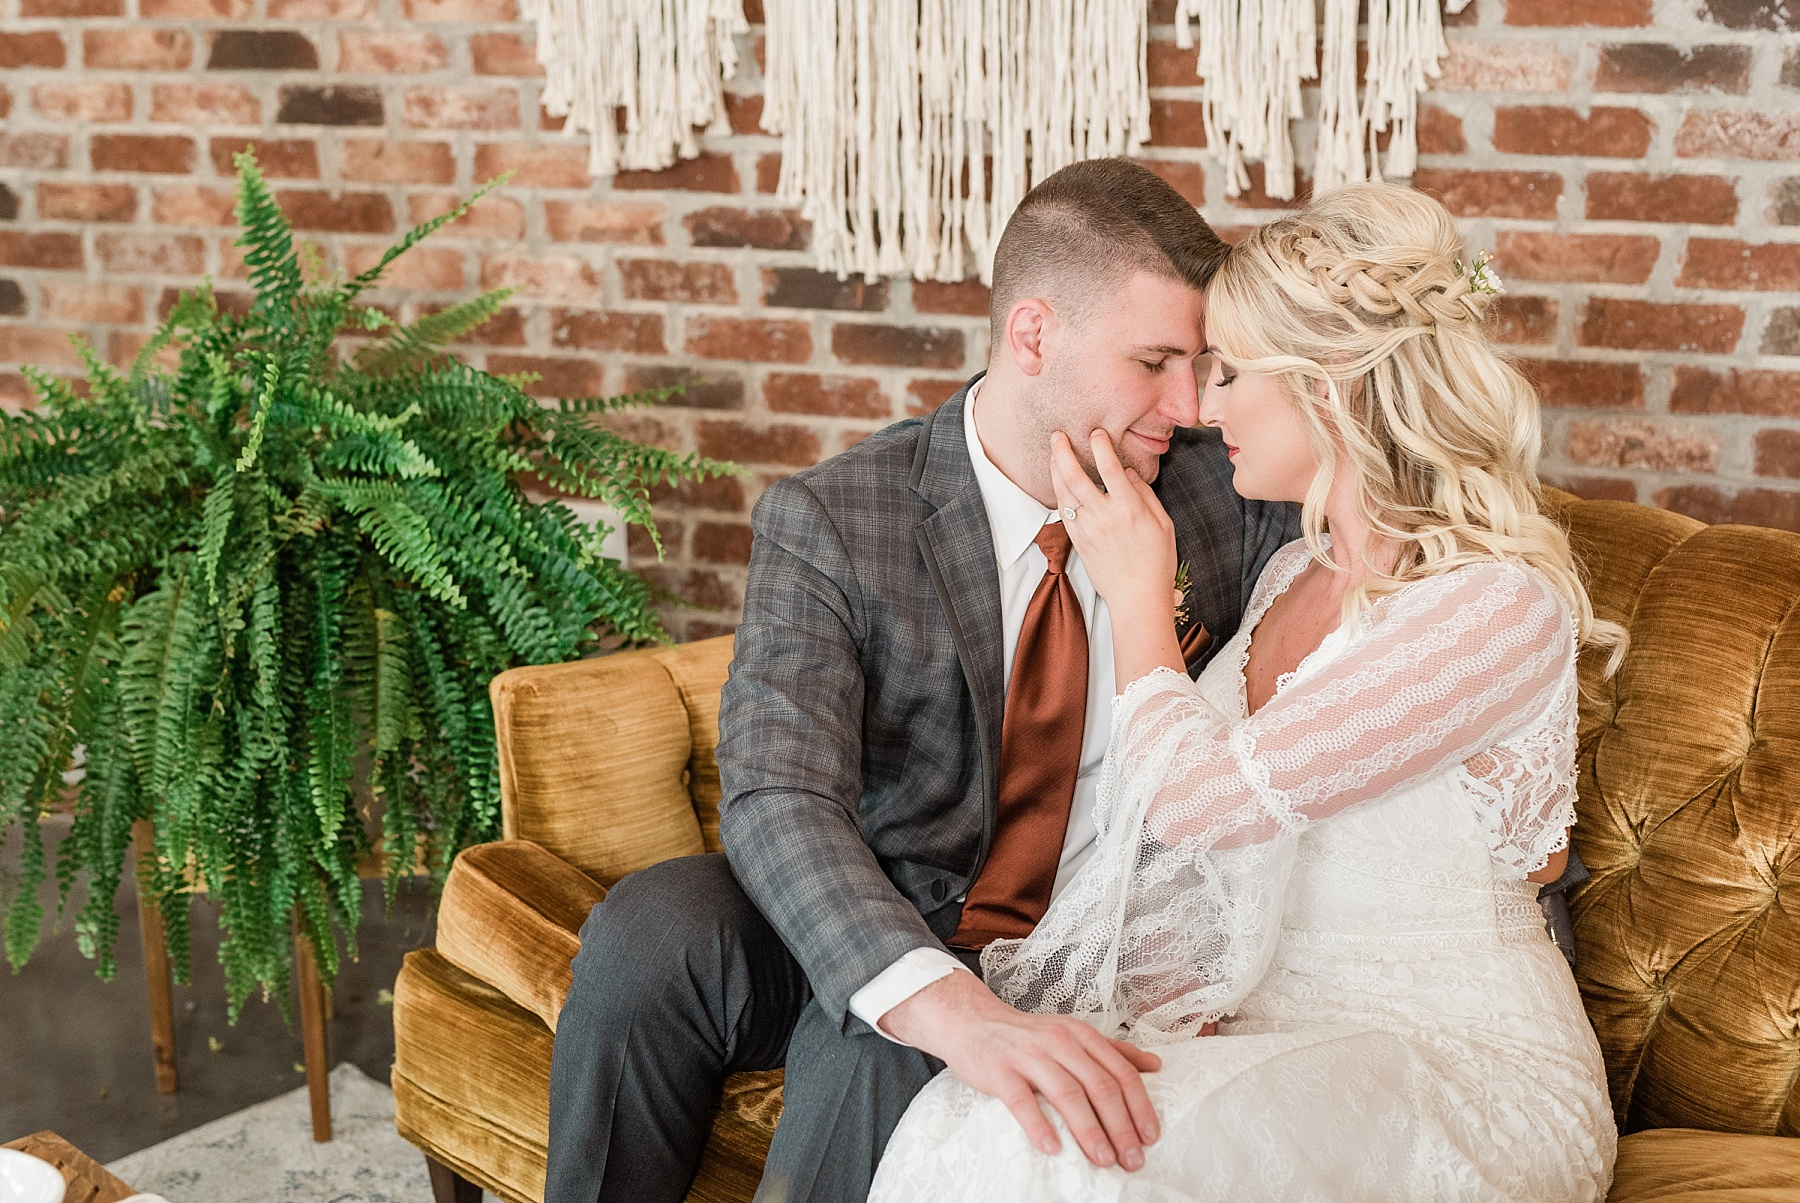 Eclectic Scandinavian Winter Wedding in All White Venue Emerson Fields by Kelsi Kliethermes Photography Best Missouri and Maui Wedding Photographer_0018.jpg